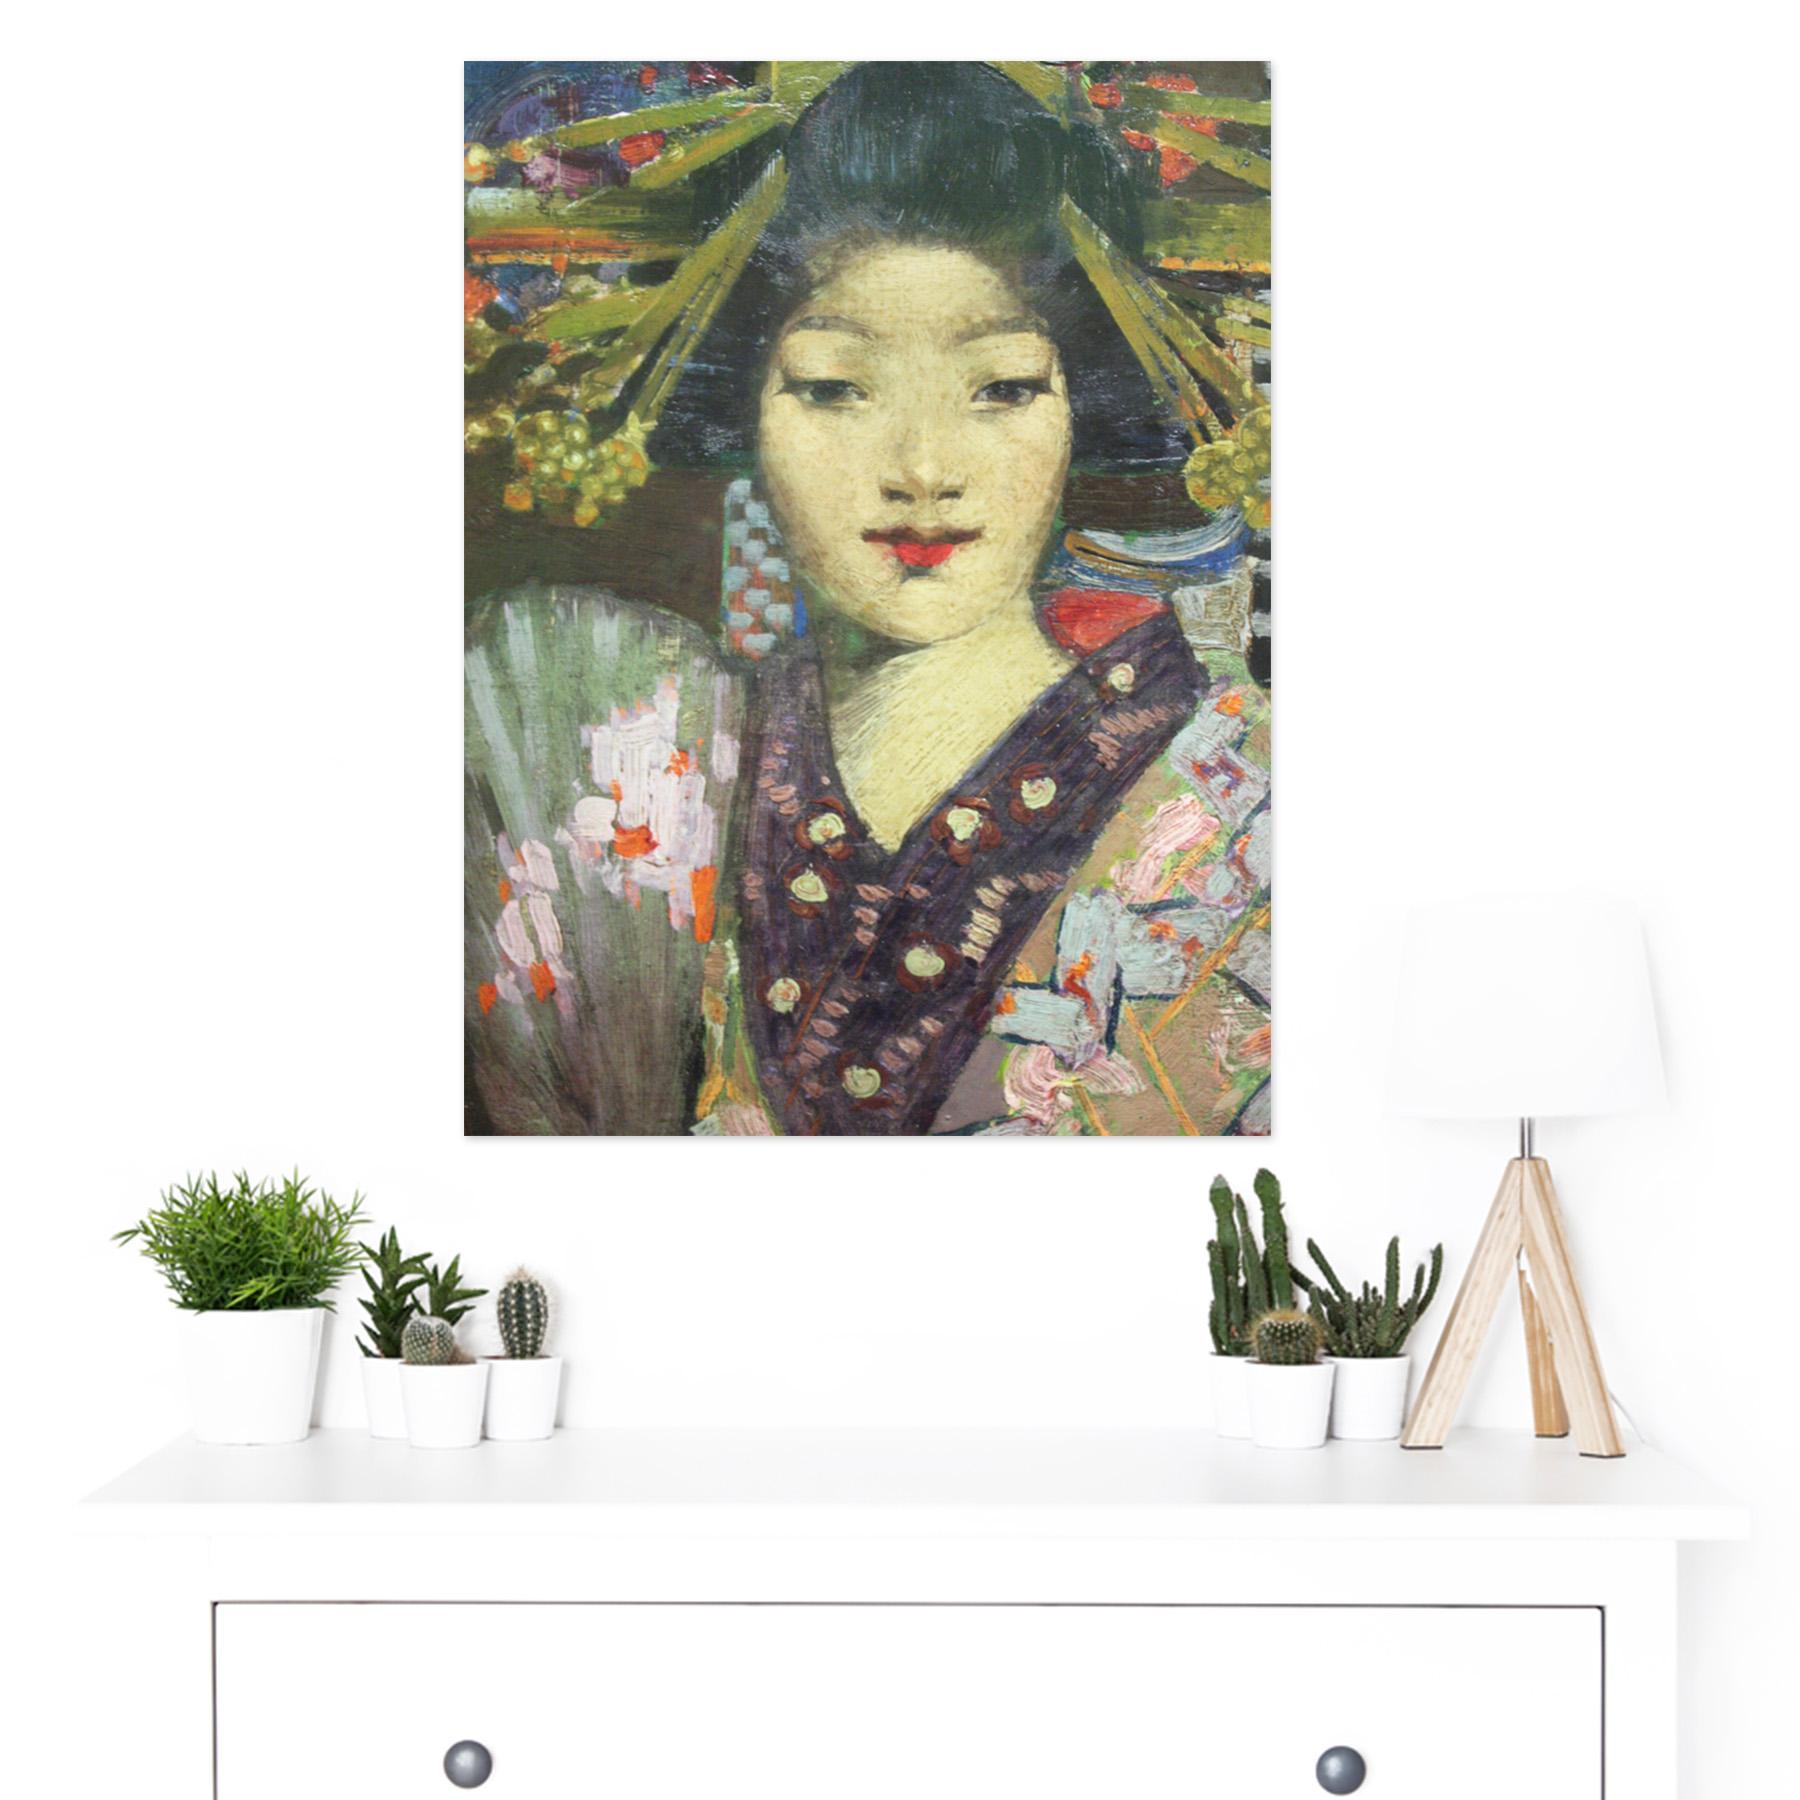 Henry-Geisha-Girl-Detail-Painting-Large-Framed-Art-Print thumbnail 3